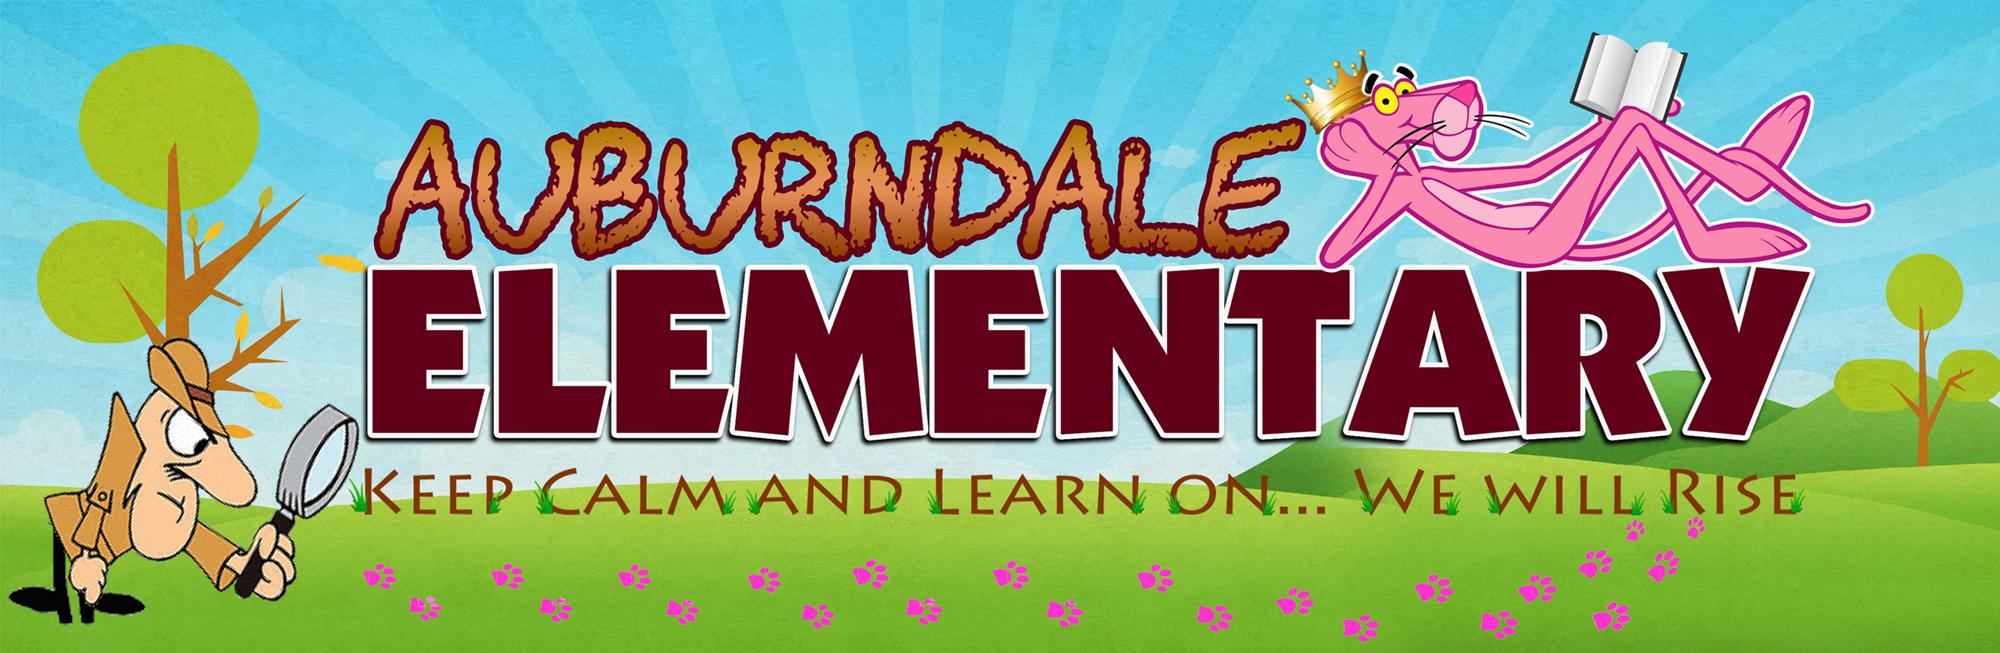 Auburndale Elementary